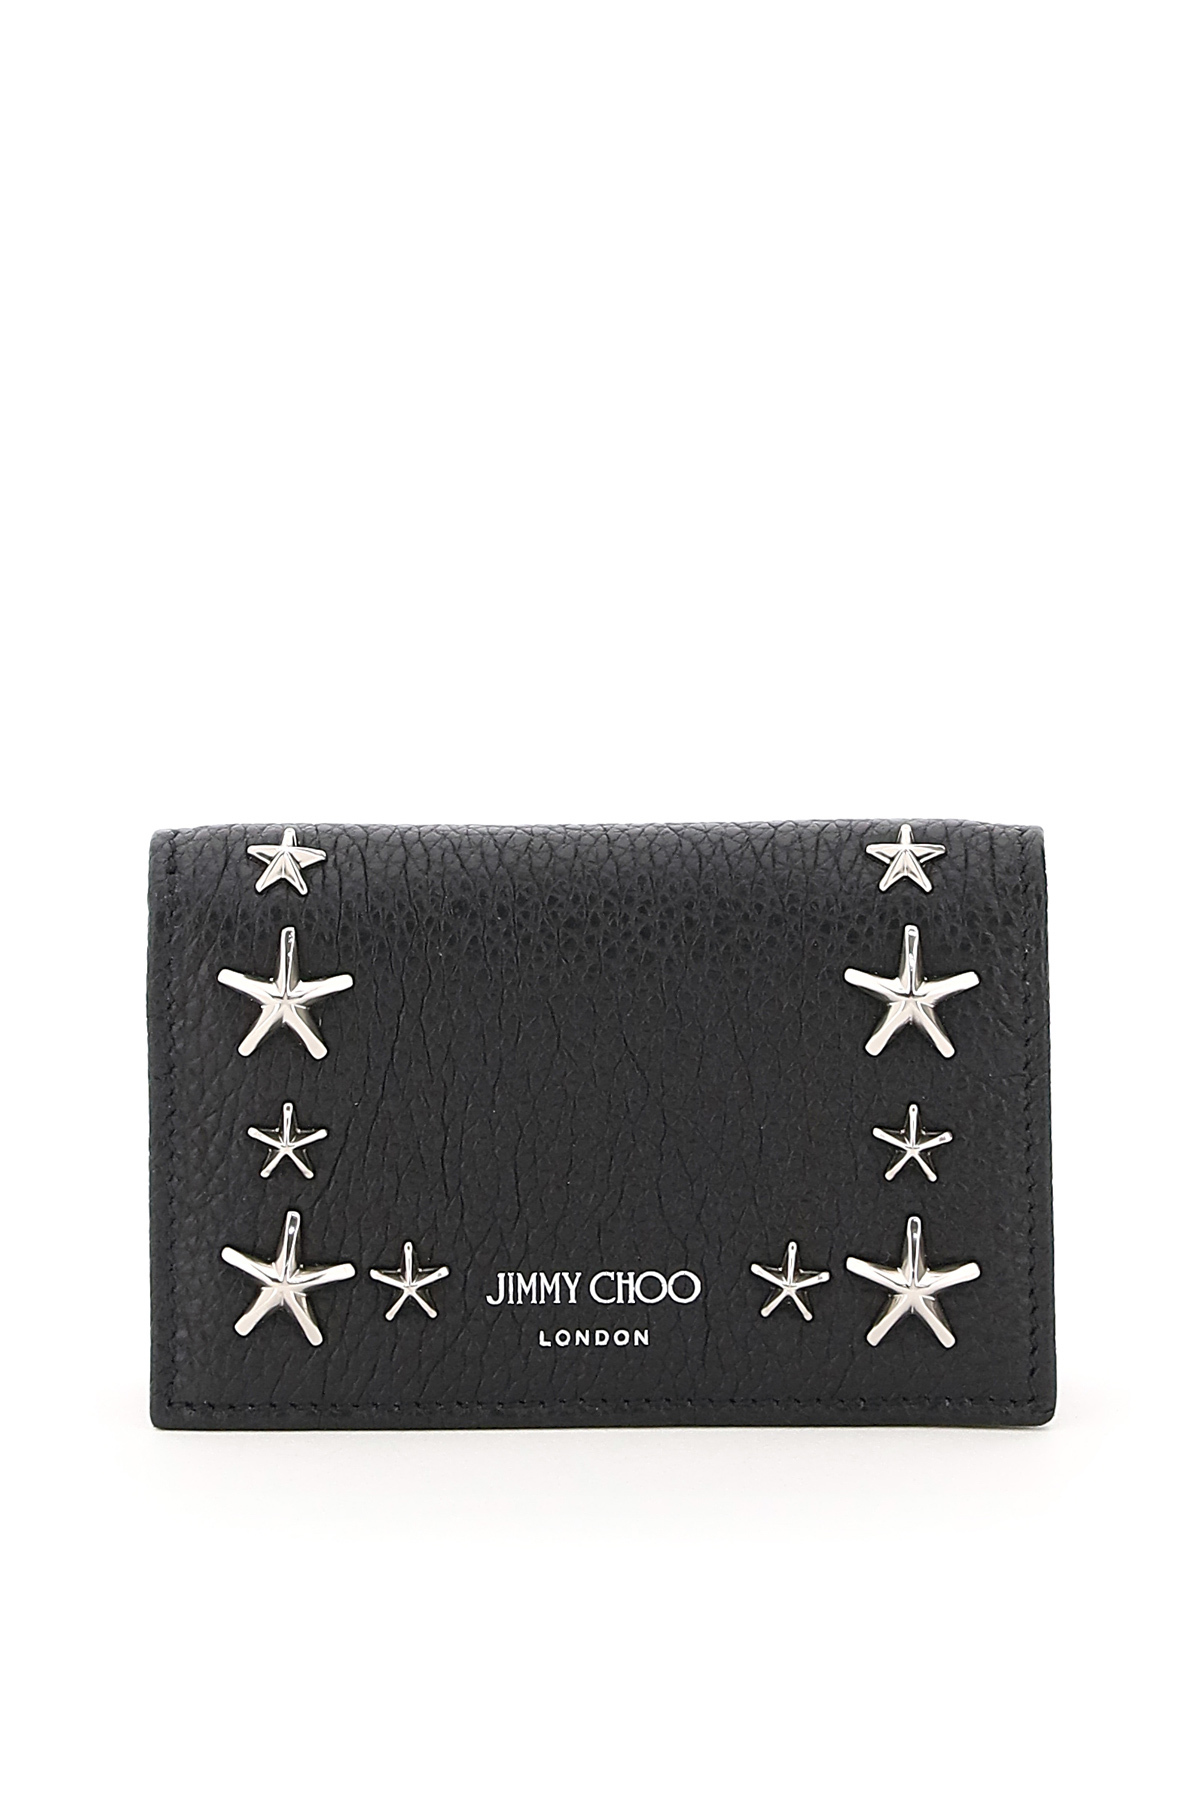 Jimmy choo porta carte di credito star studs multitasche